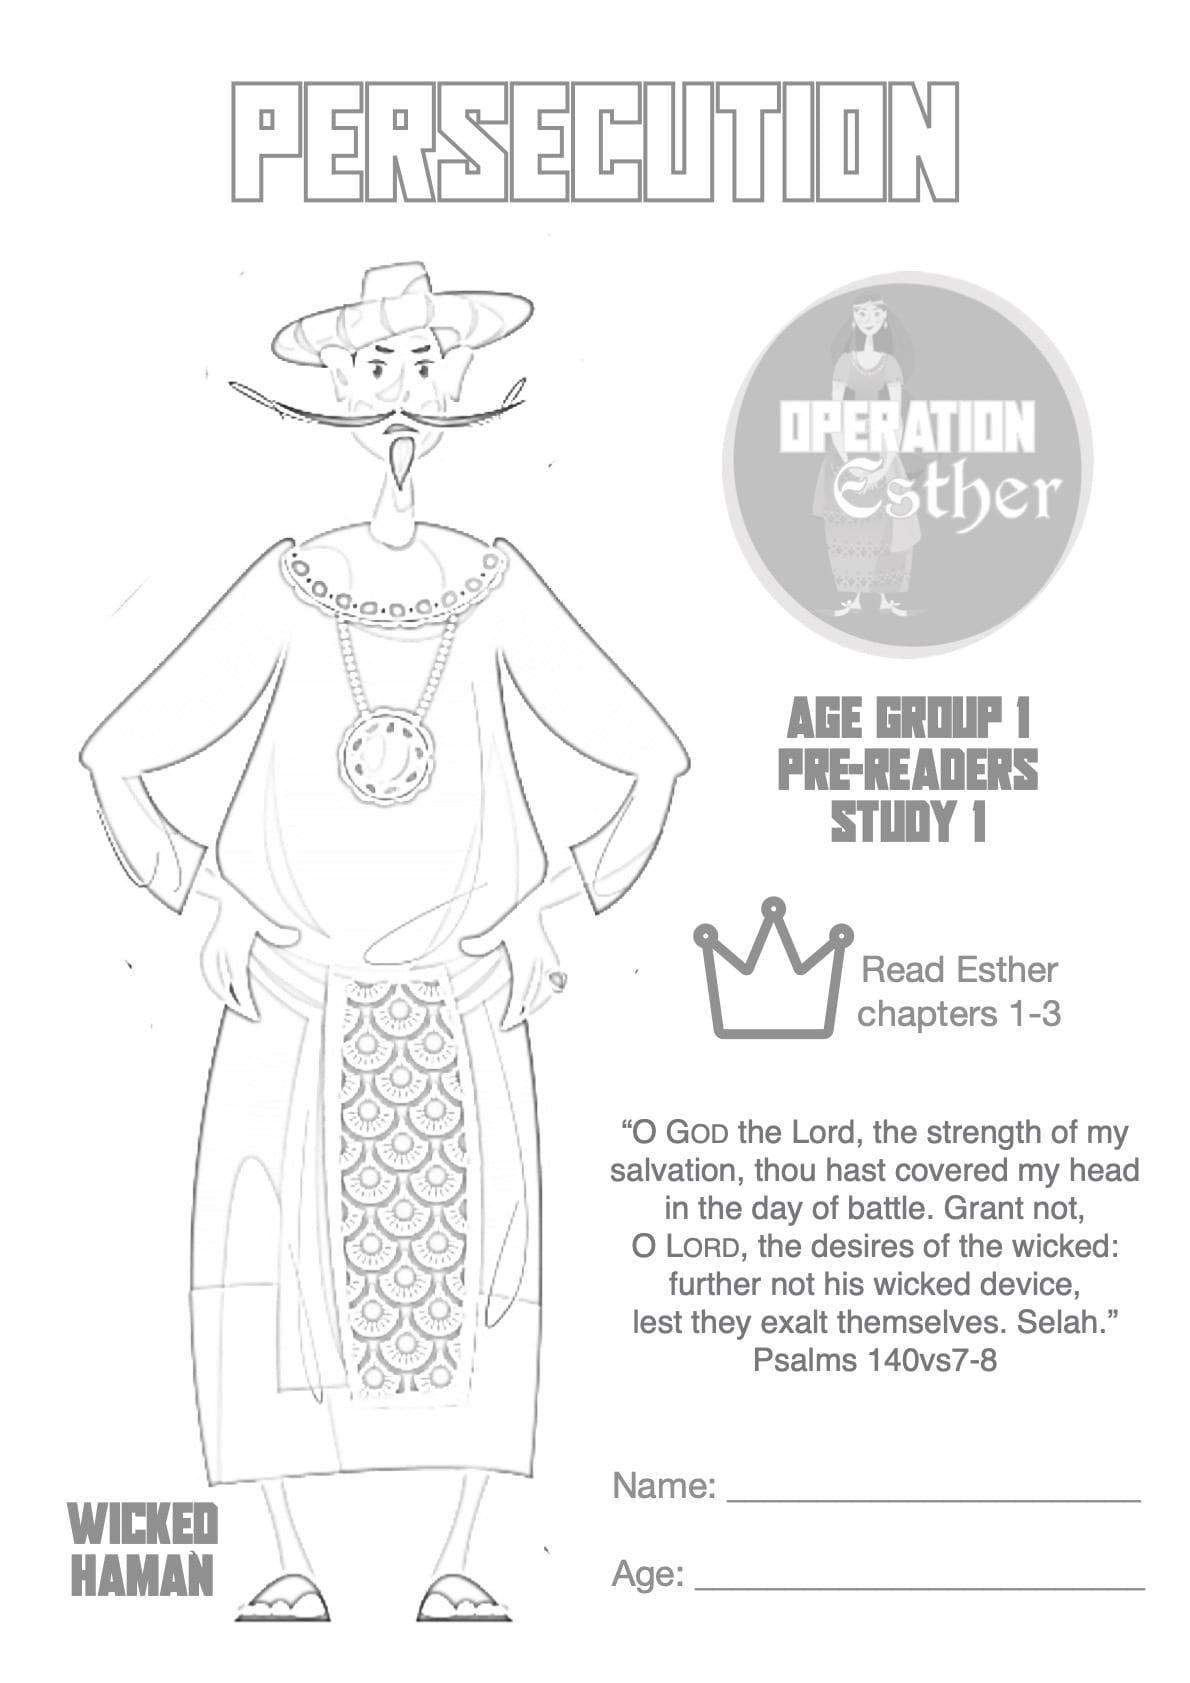 OE - Study 1 - Pre-readers